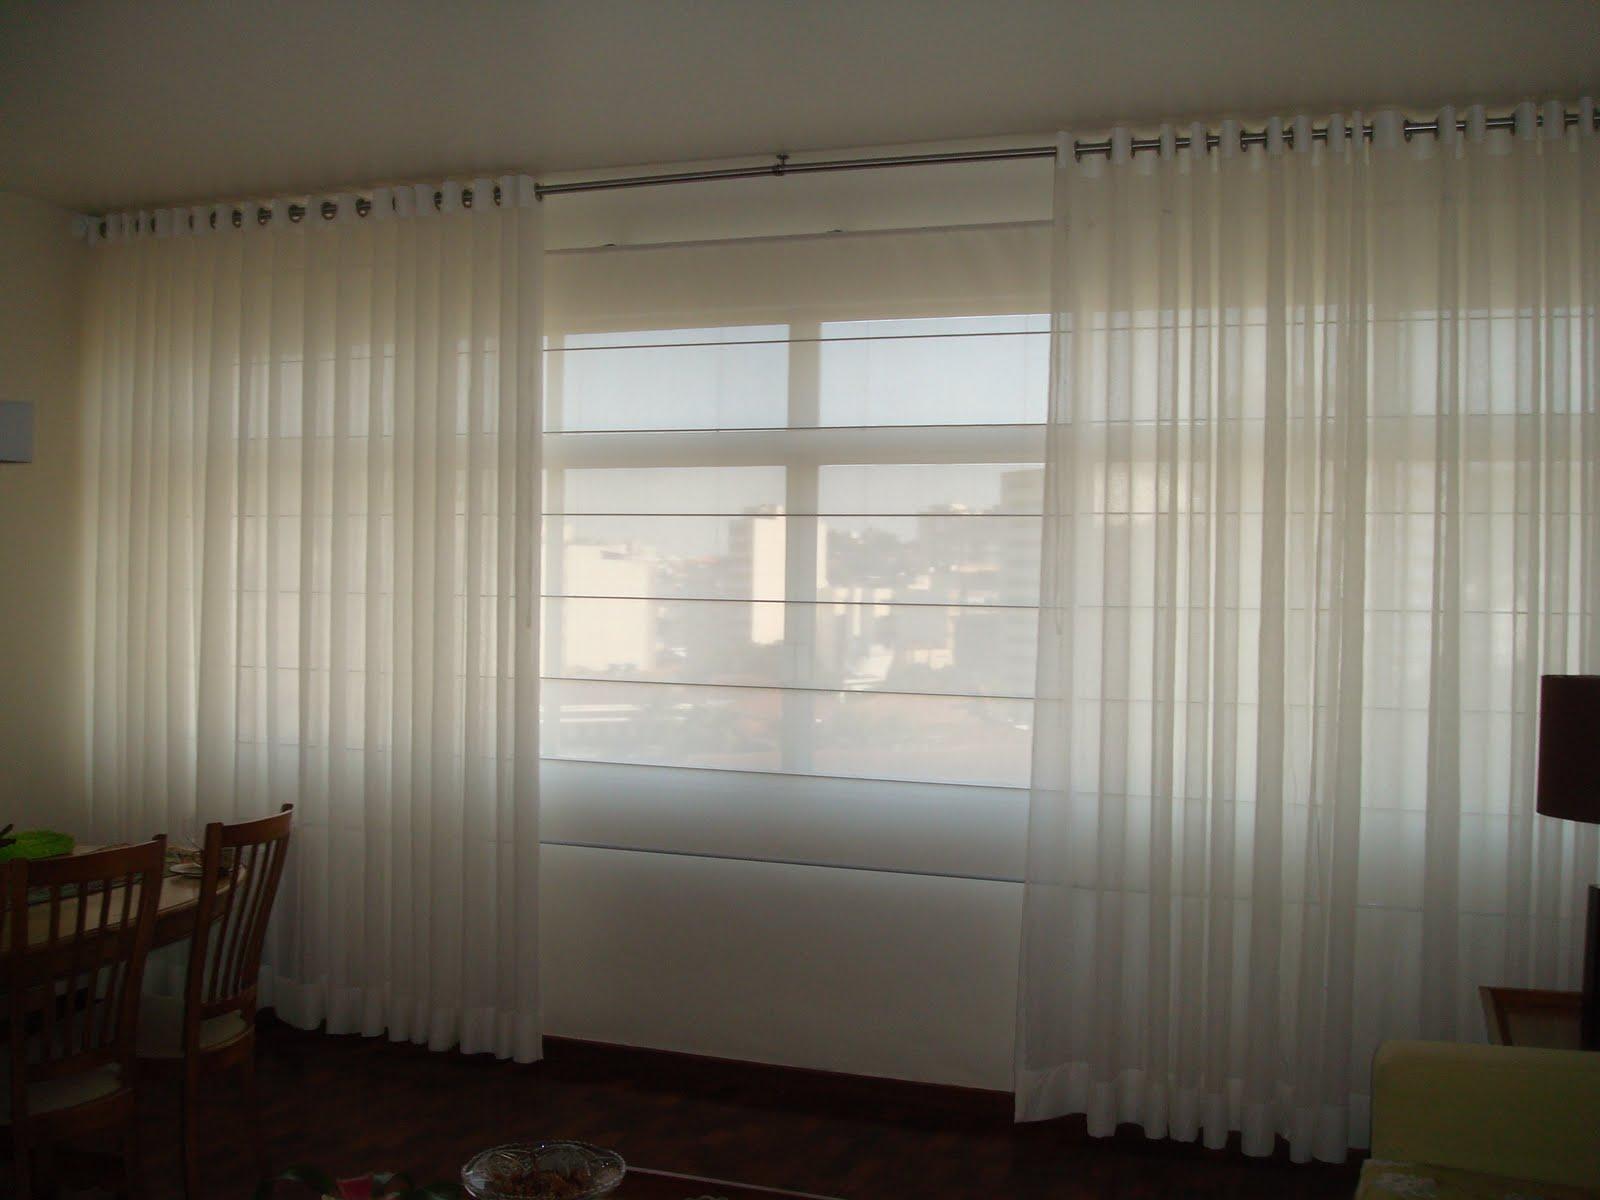 Yeda Moura Cortina romana de tela solar (trilho suisso), na frente cortina d